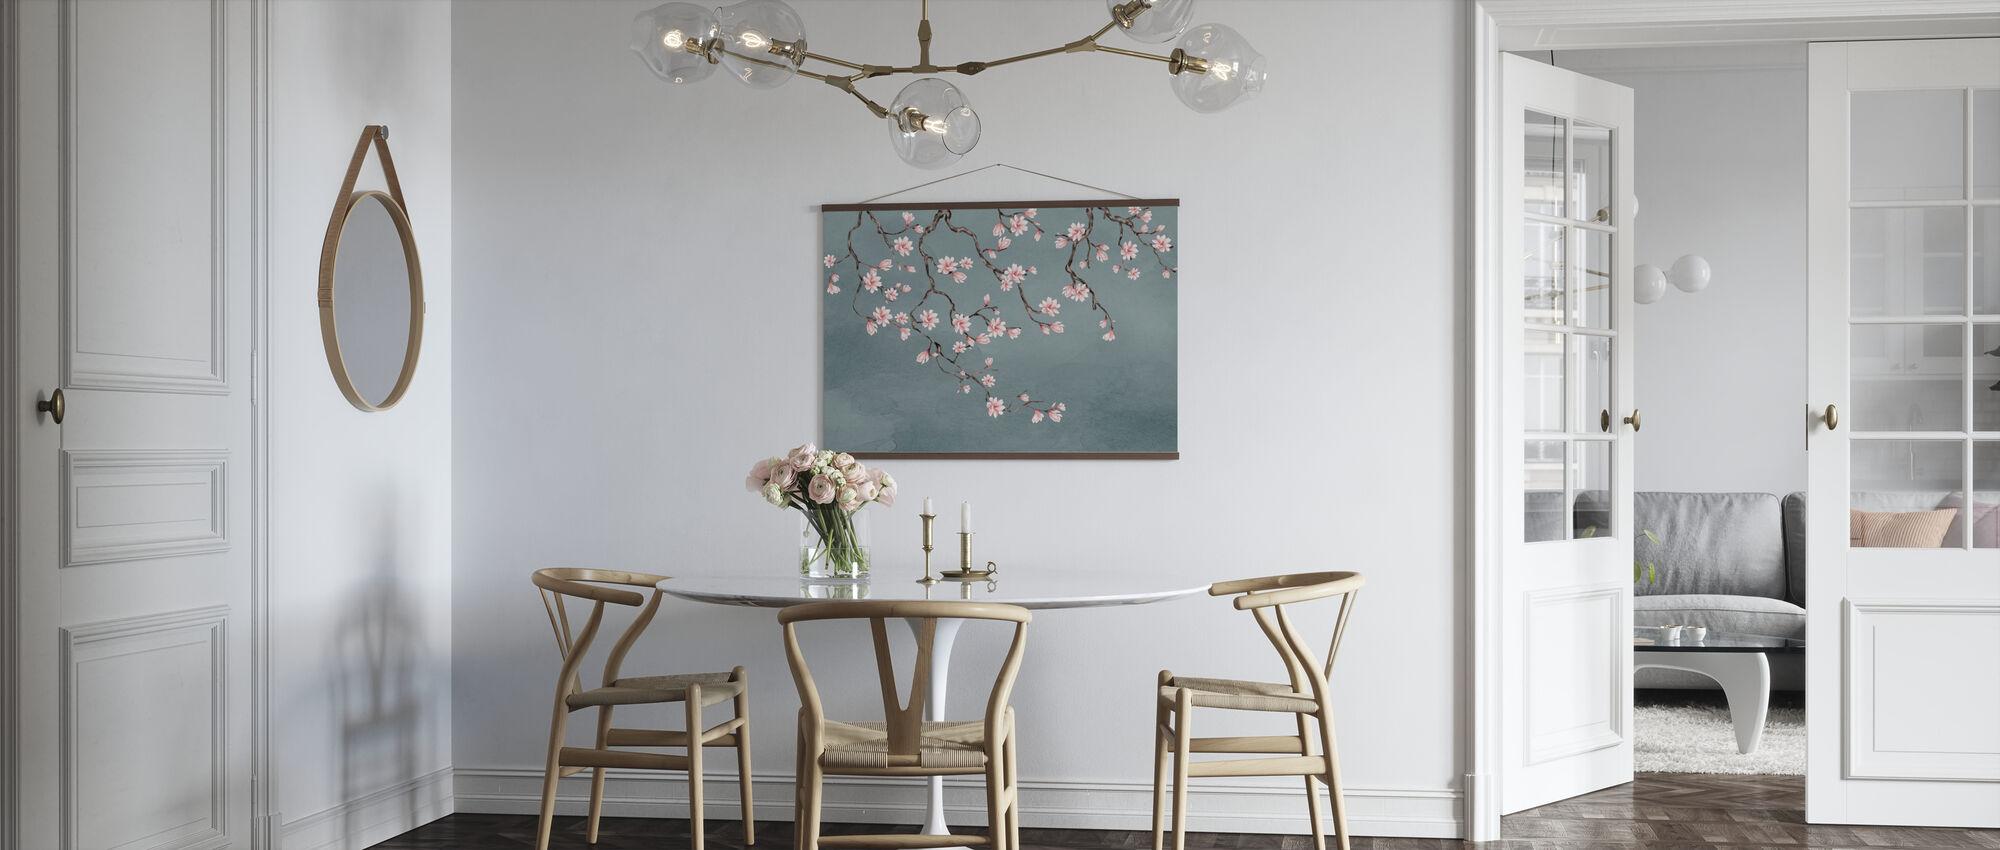 Floraison Branches - Poster - Kitchen